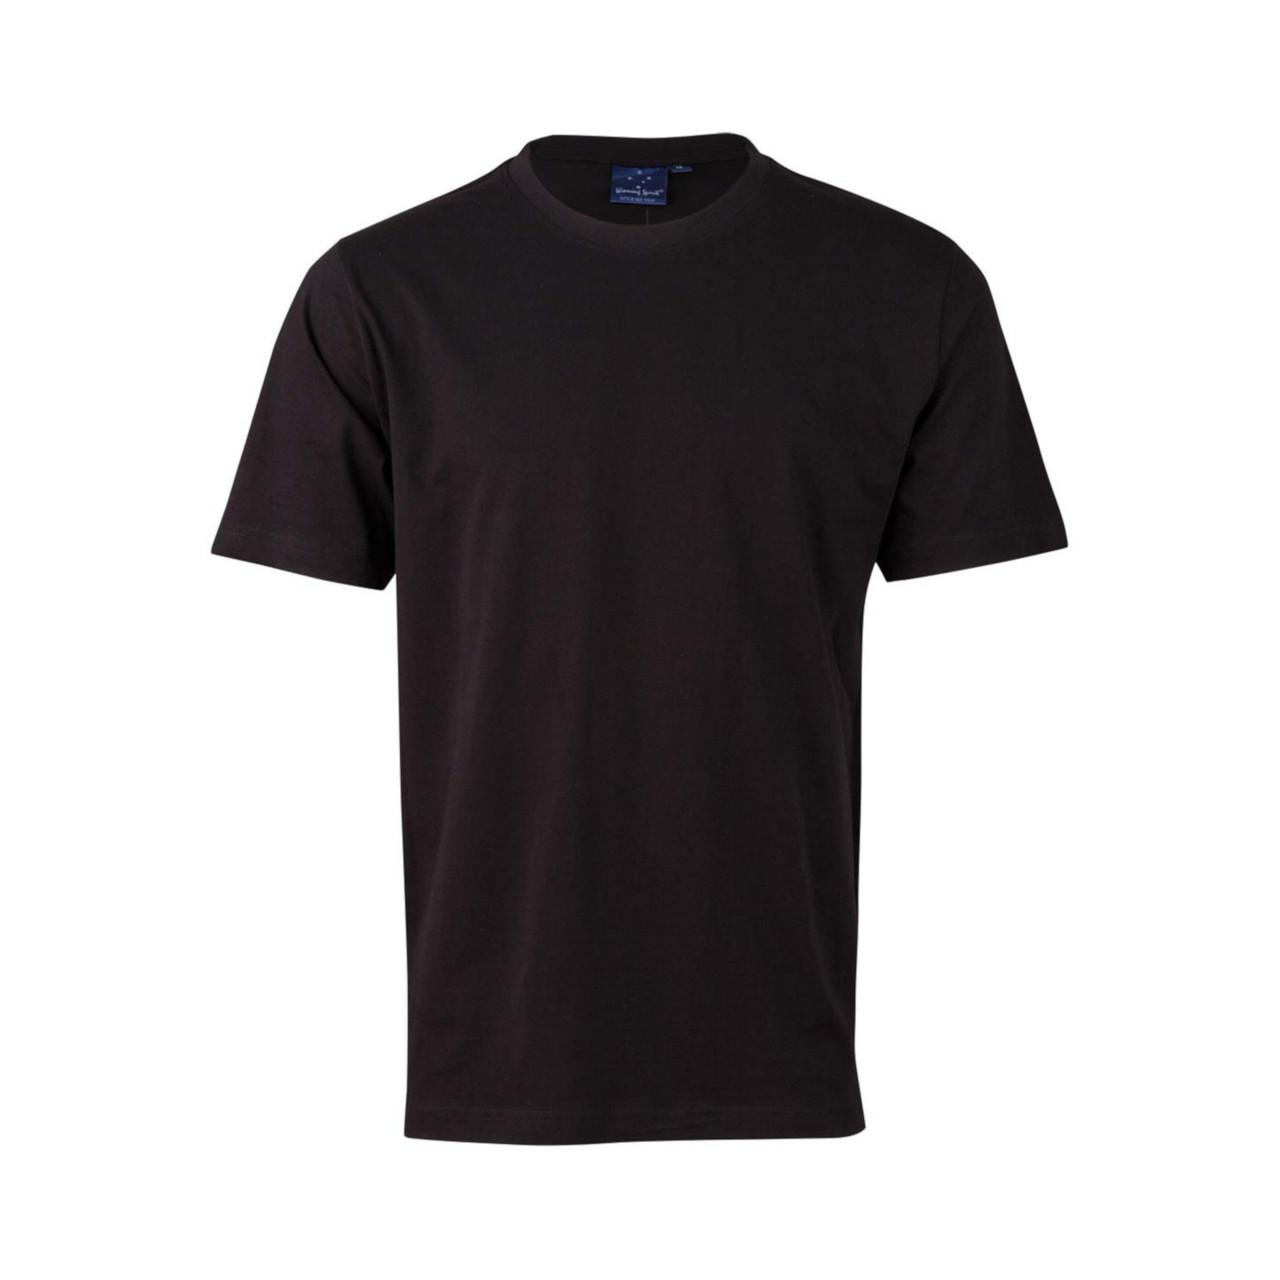 Green 3 Women's Black Sheep Short Sleeve T Shirt Green 100% Organic Cotton Tee